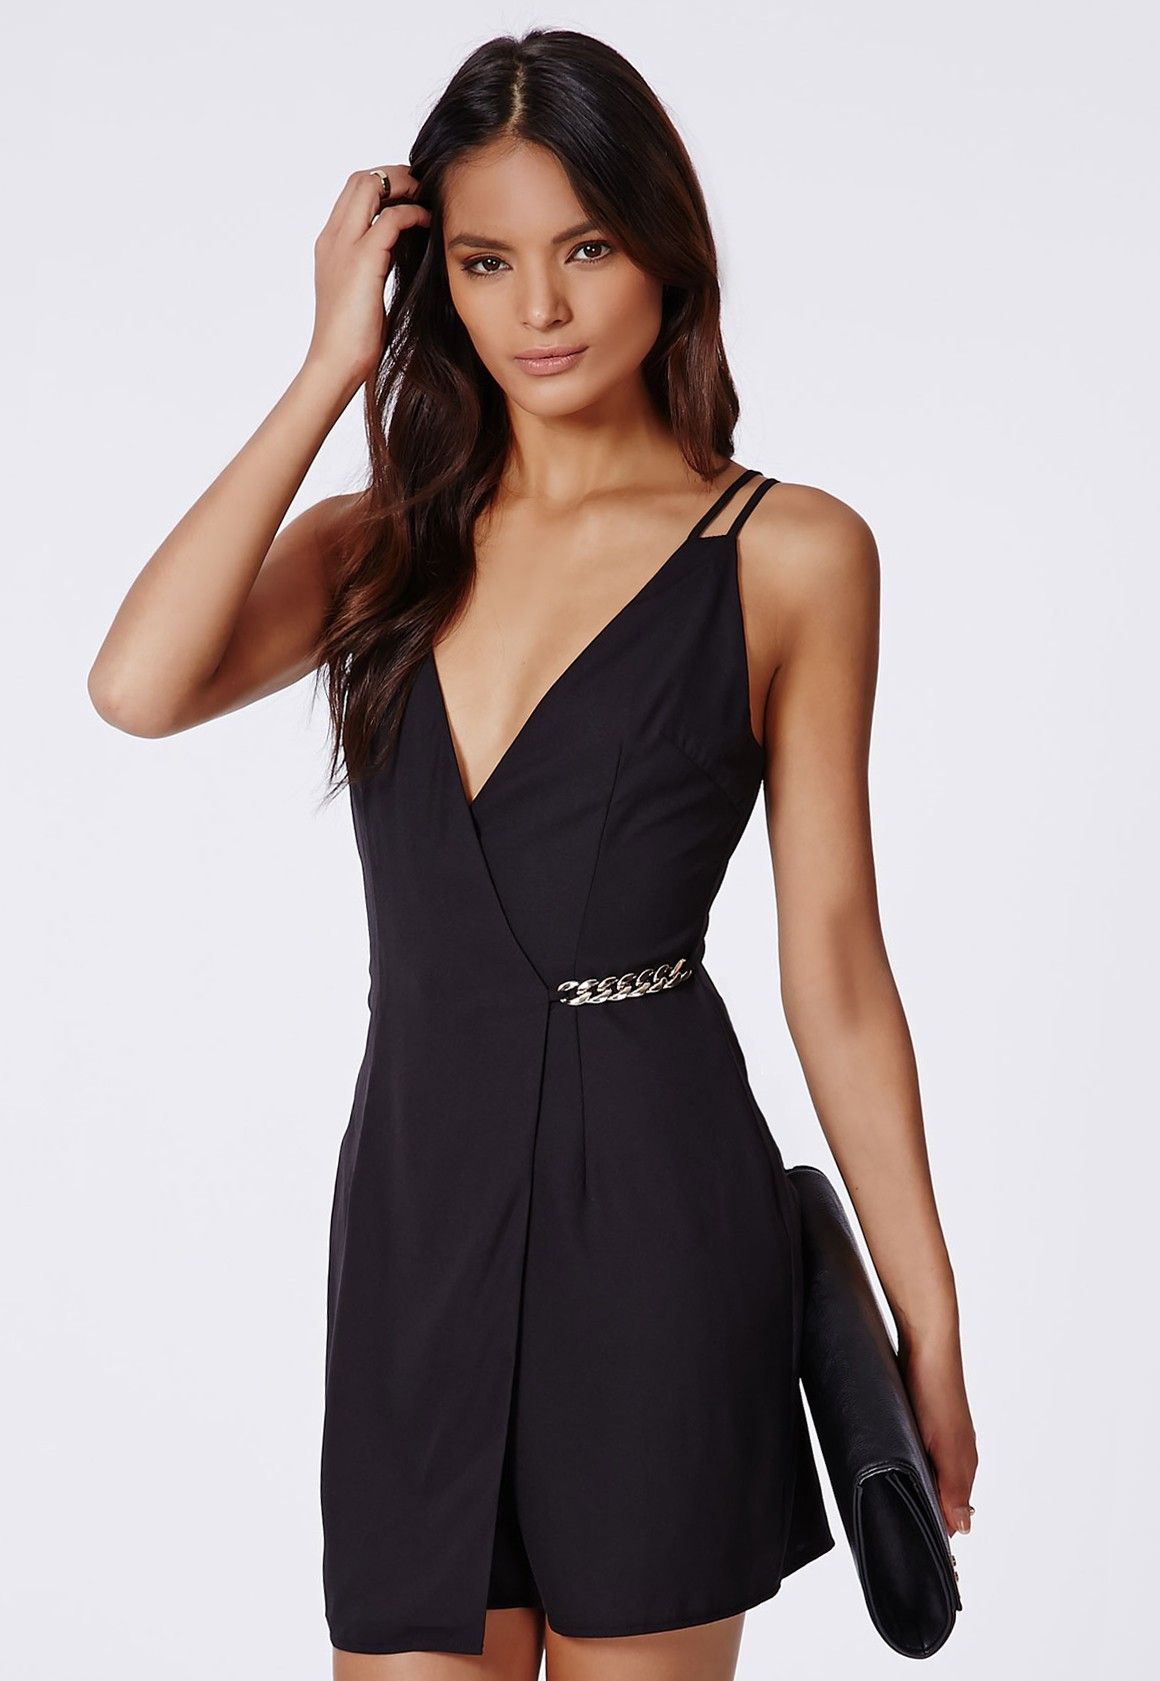 fe5e659d02 Judy Crepe Side Gold Chain Shift Dress Black - Dresses - Shift Dresses -  Missguided